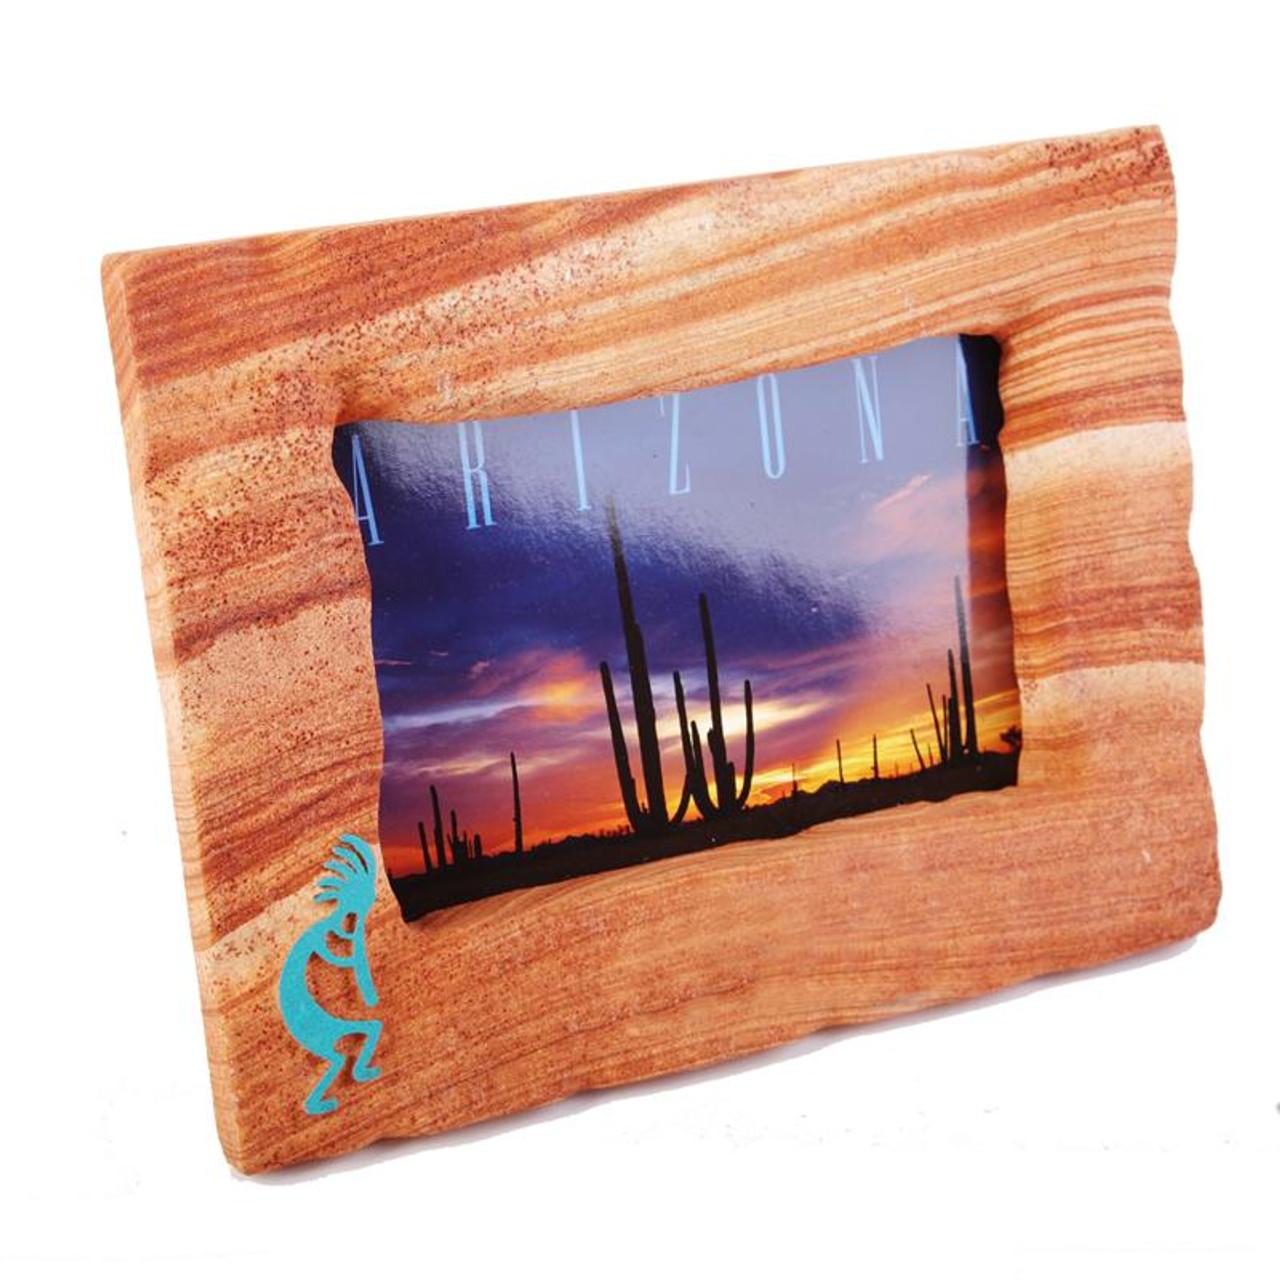 Sandstone Picture Frame w/Turquoise Kokopelli - Landscape